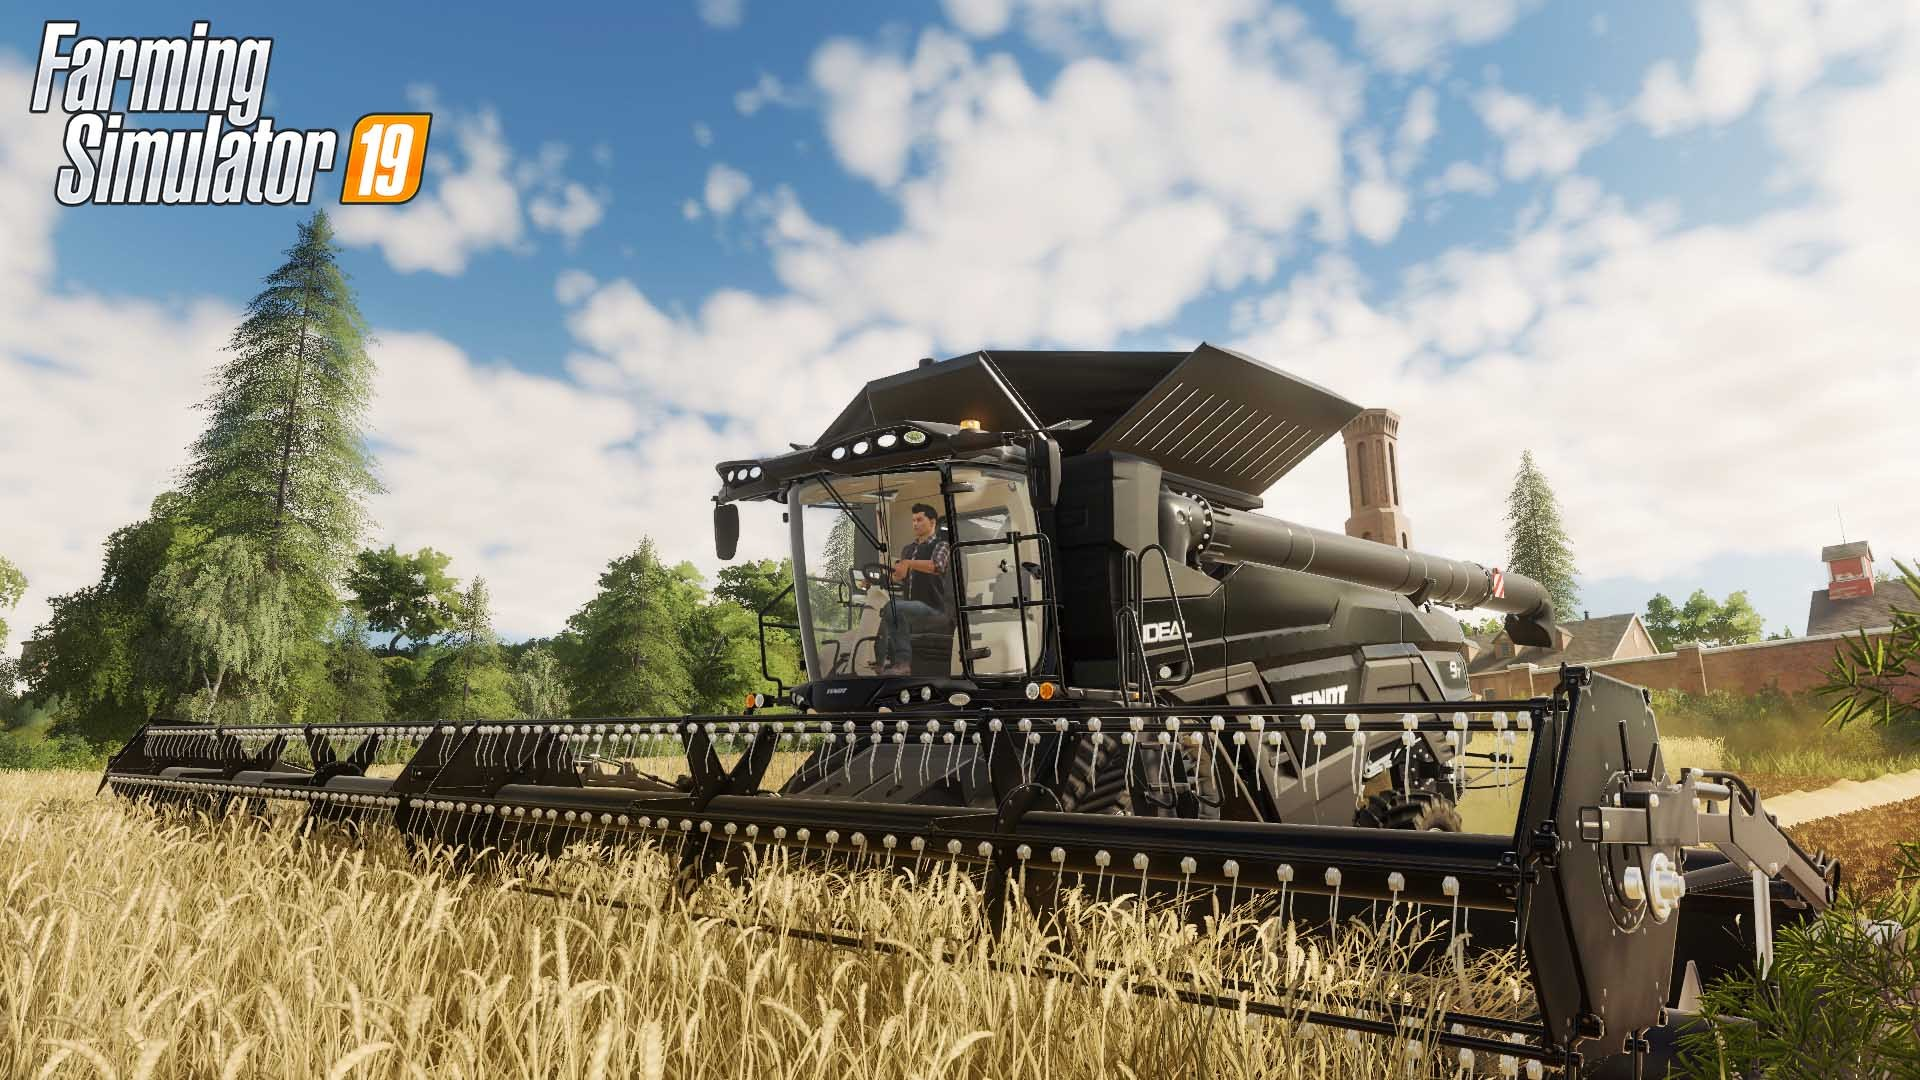 Image result for farming simulator 19